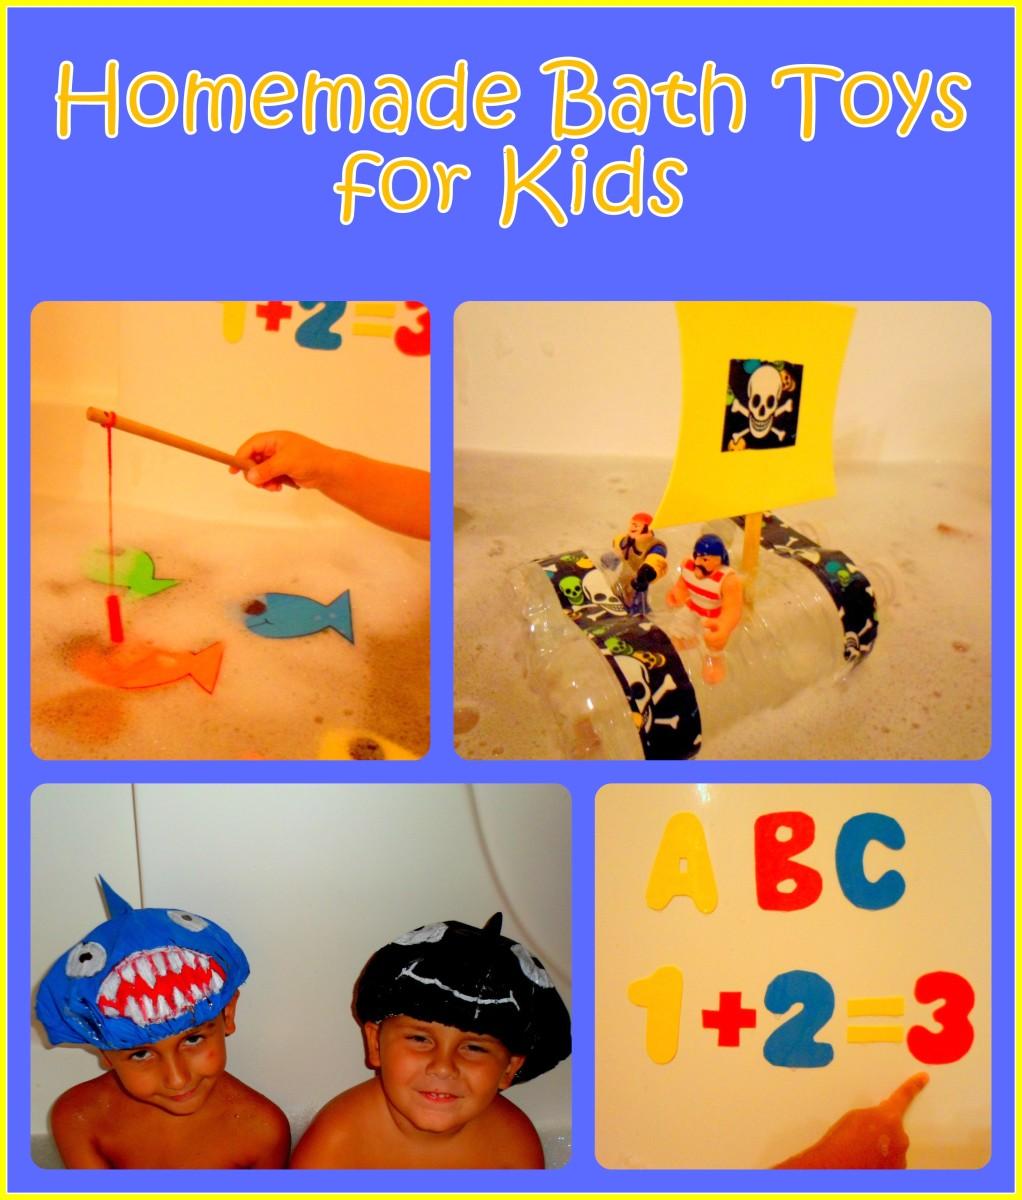 How to Make Homemade Bath Toys for Kids | WeHaveKids